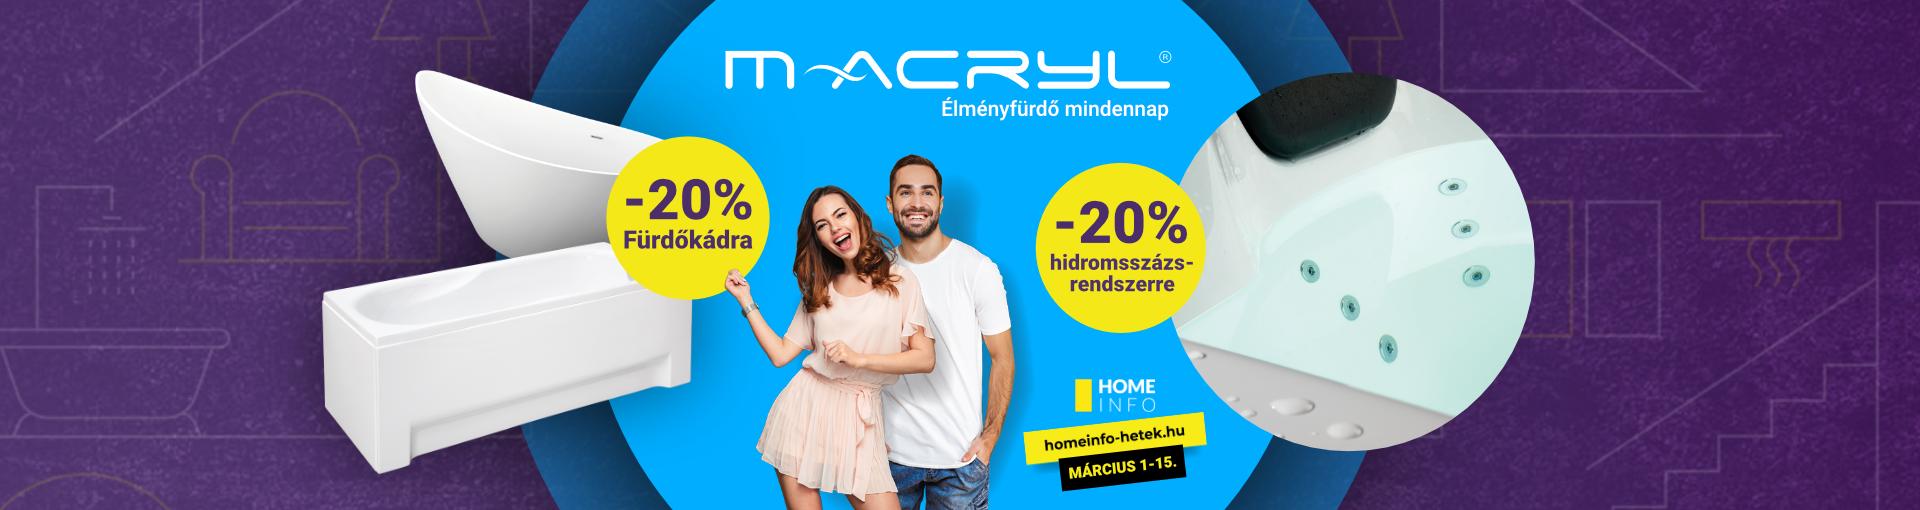 Homeinfo M-acryl